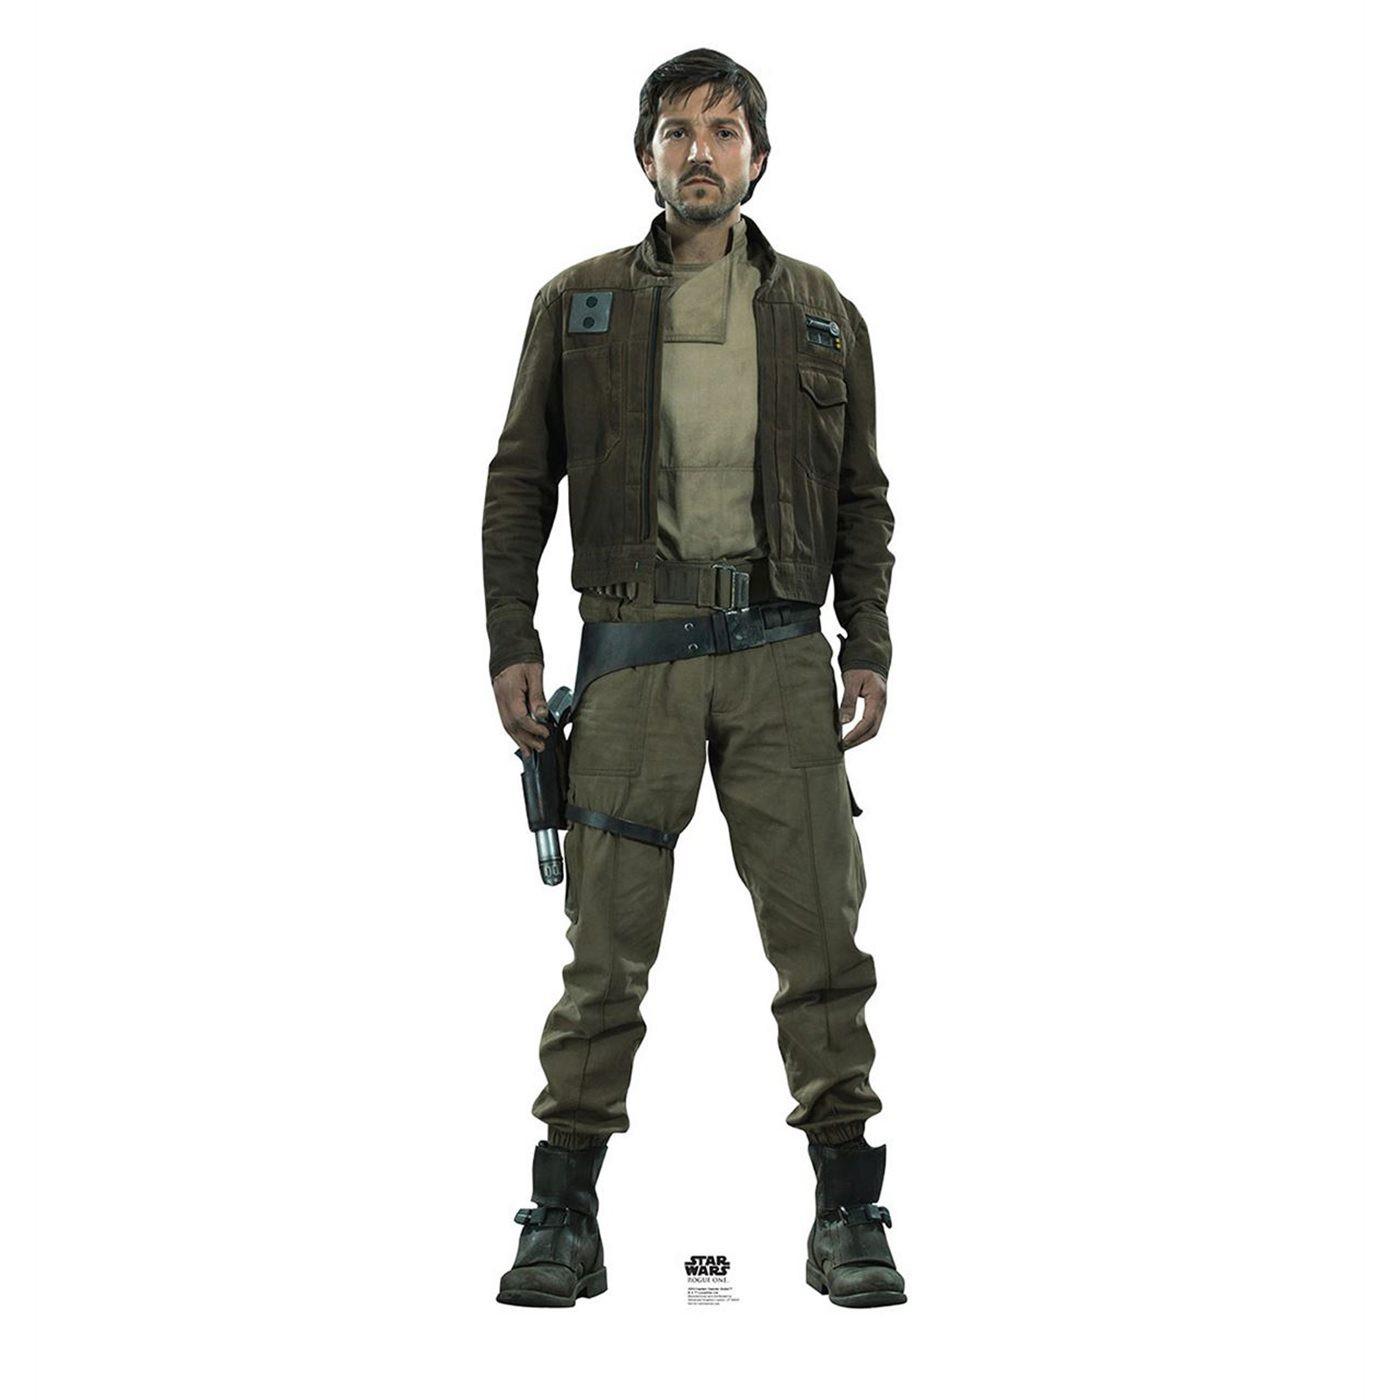 Star Wars Rogue One Captain Cassain Andor Cutout